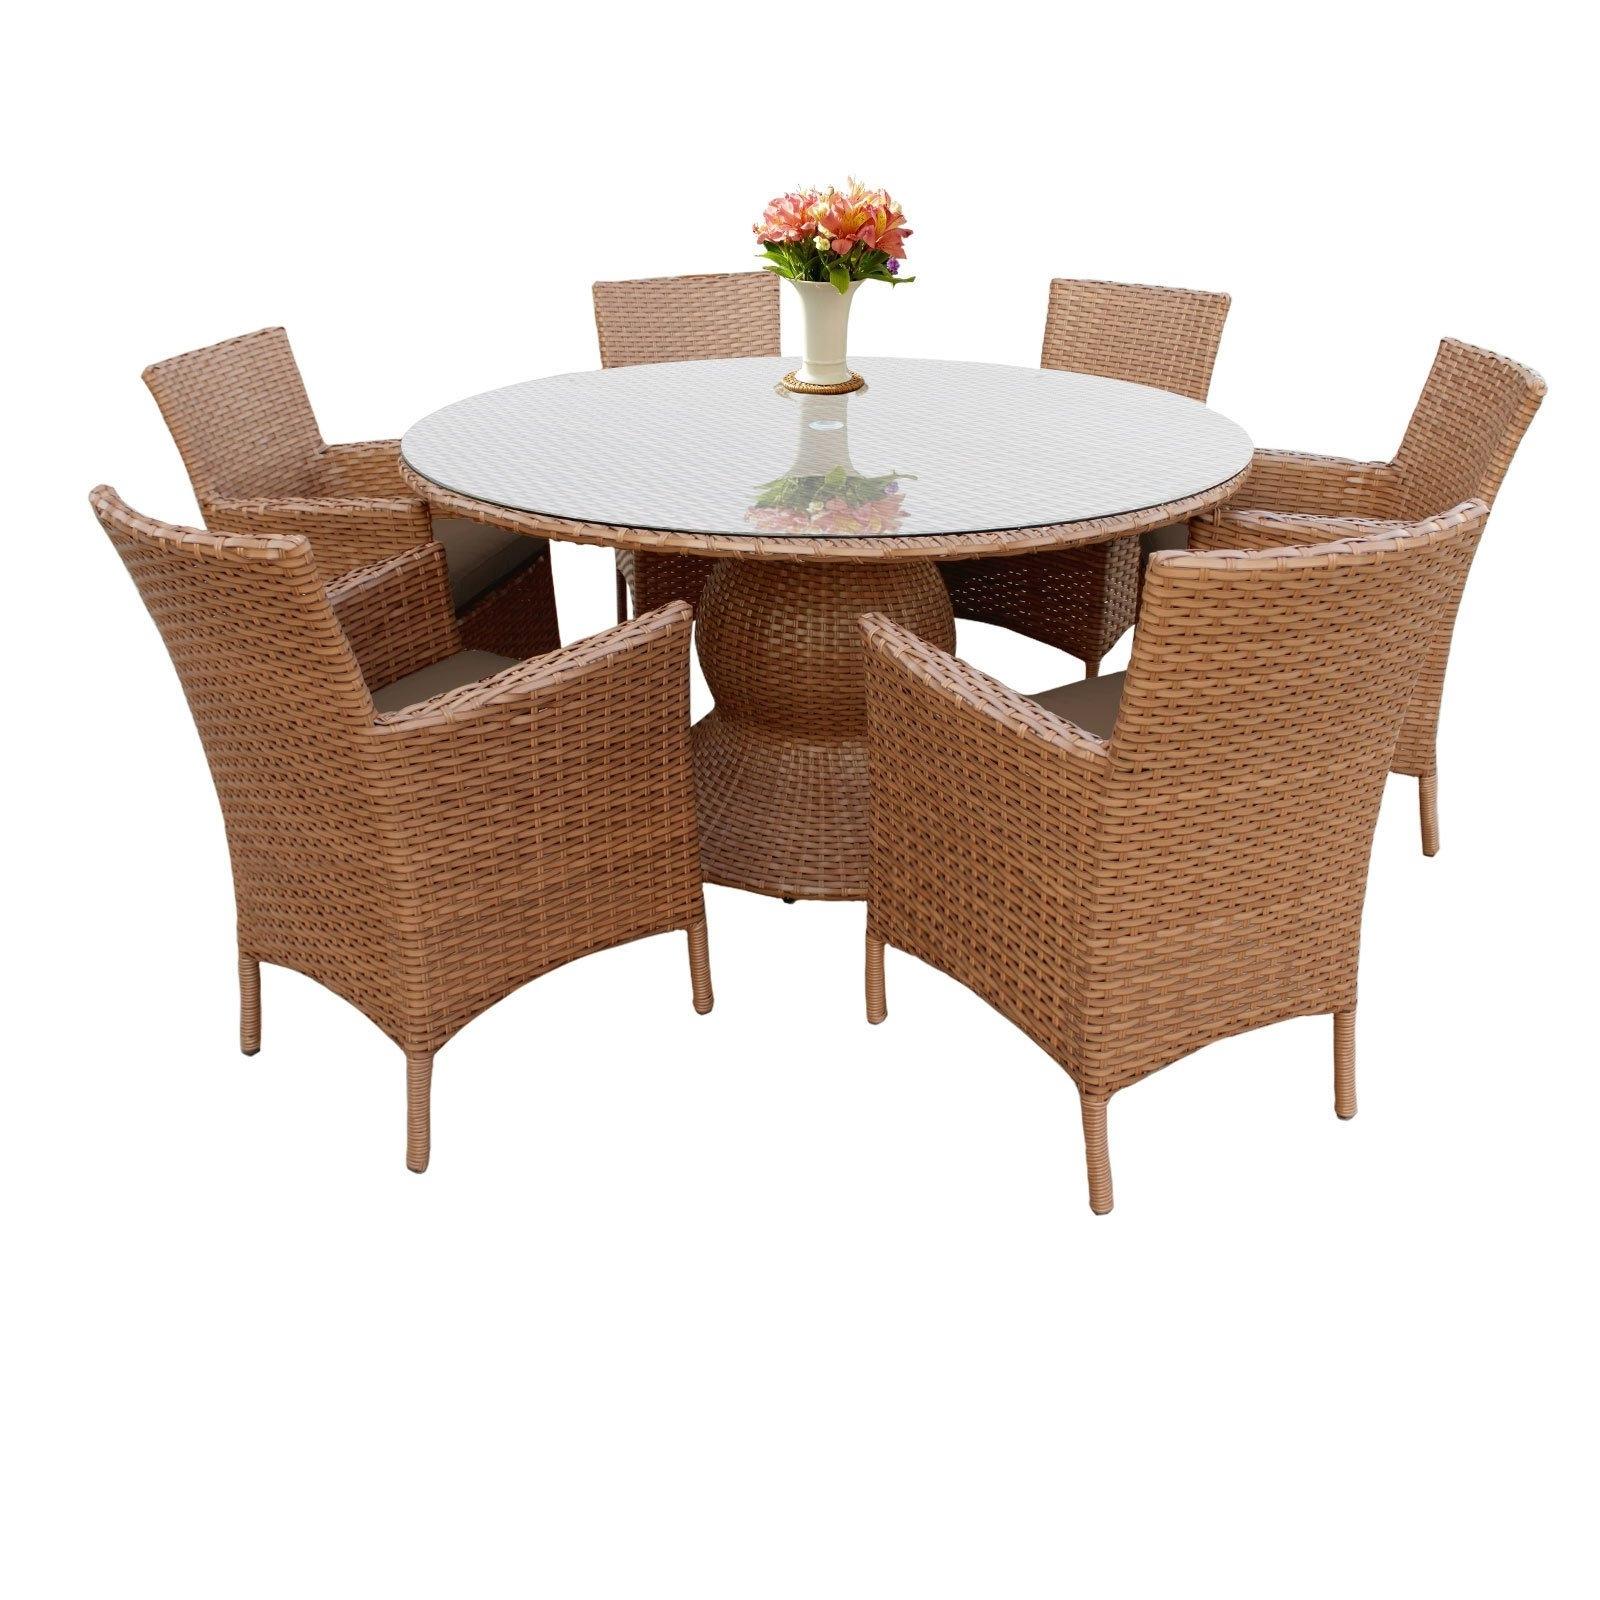 Shop Outdoor Home Bayou Wicker 60 Inch Outdoor Patio Dining Table Regarding 2018 Valencia 72 Inch 7 Piece Dining Sets (View 22 of 25)